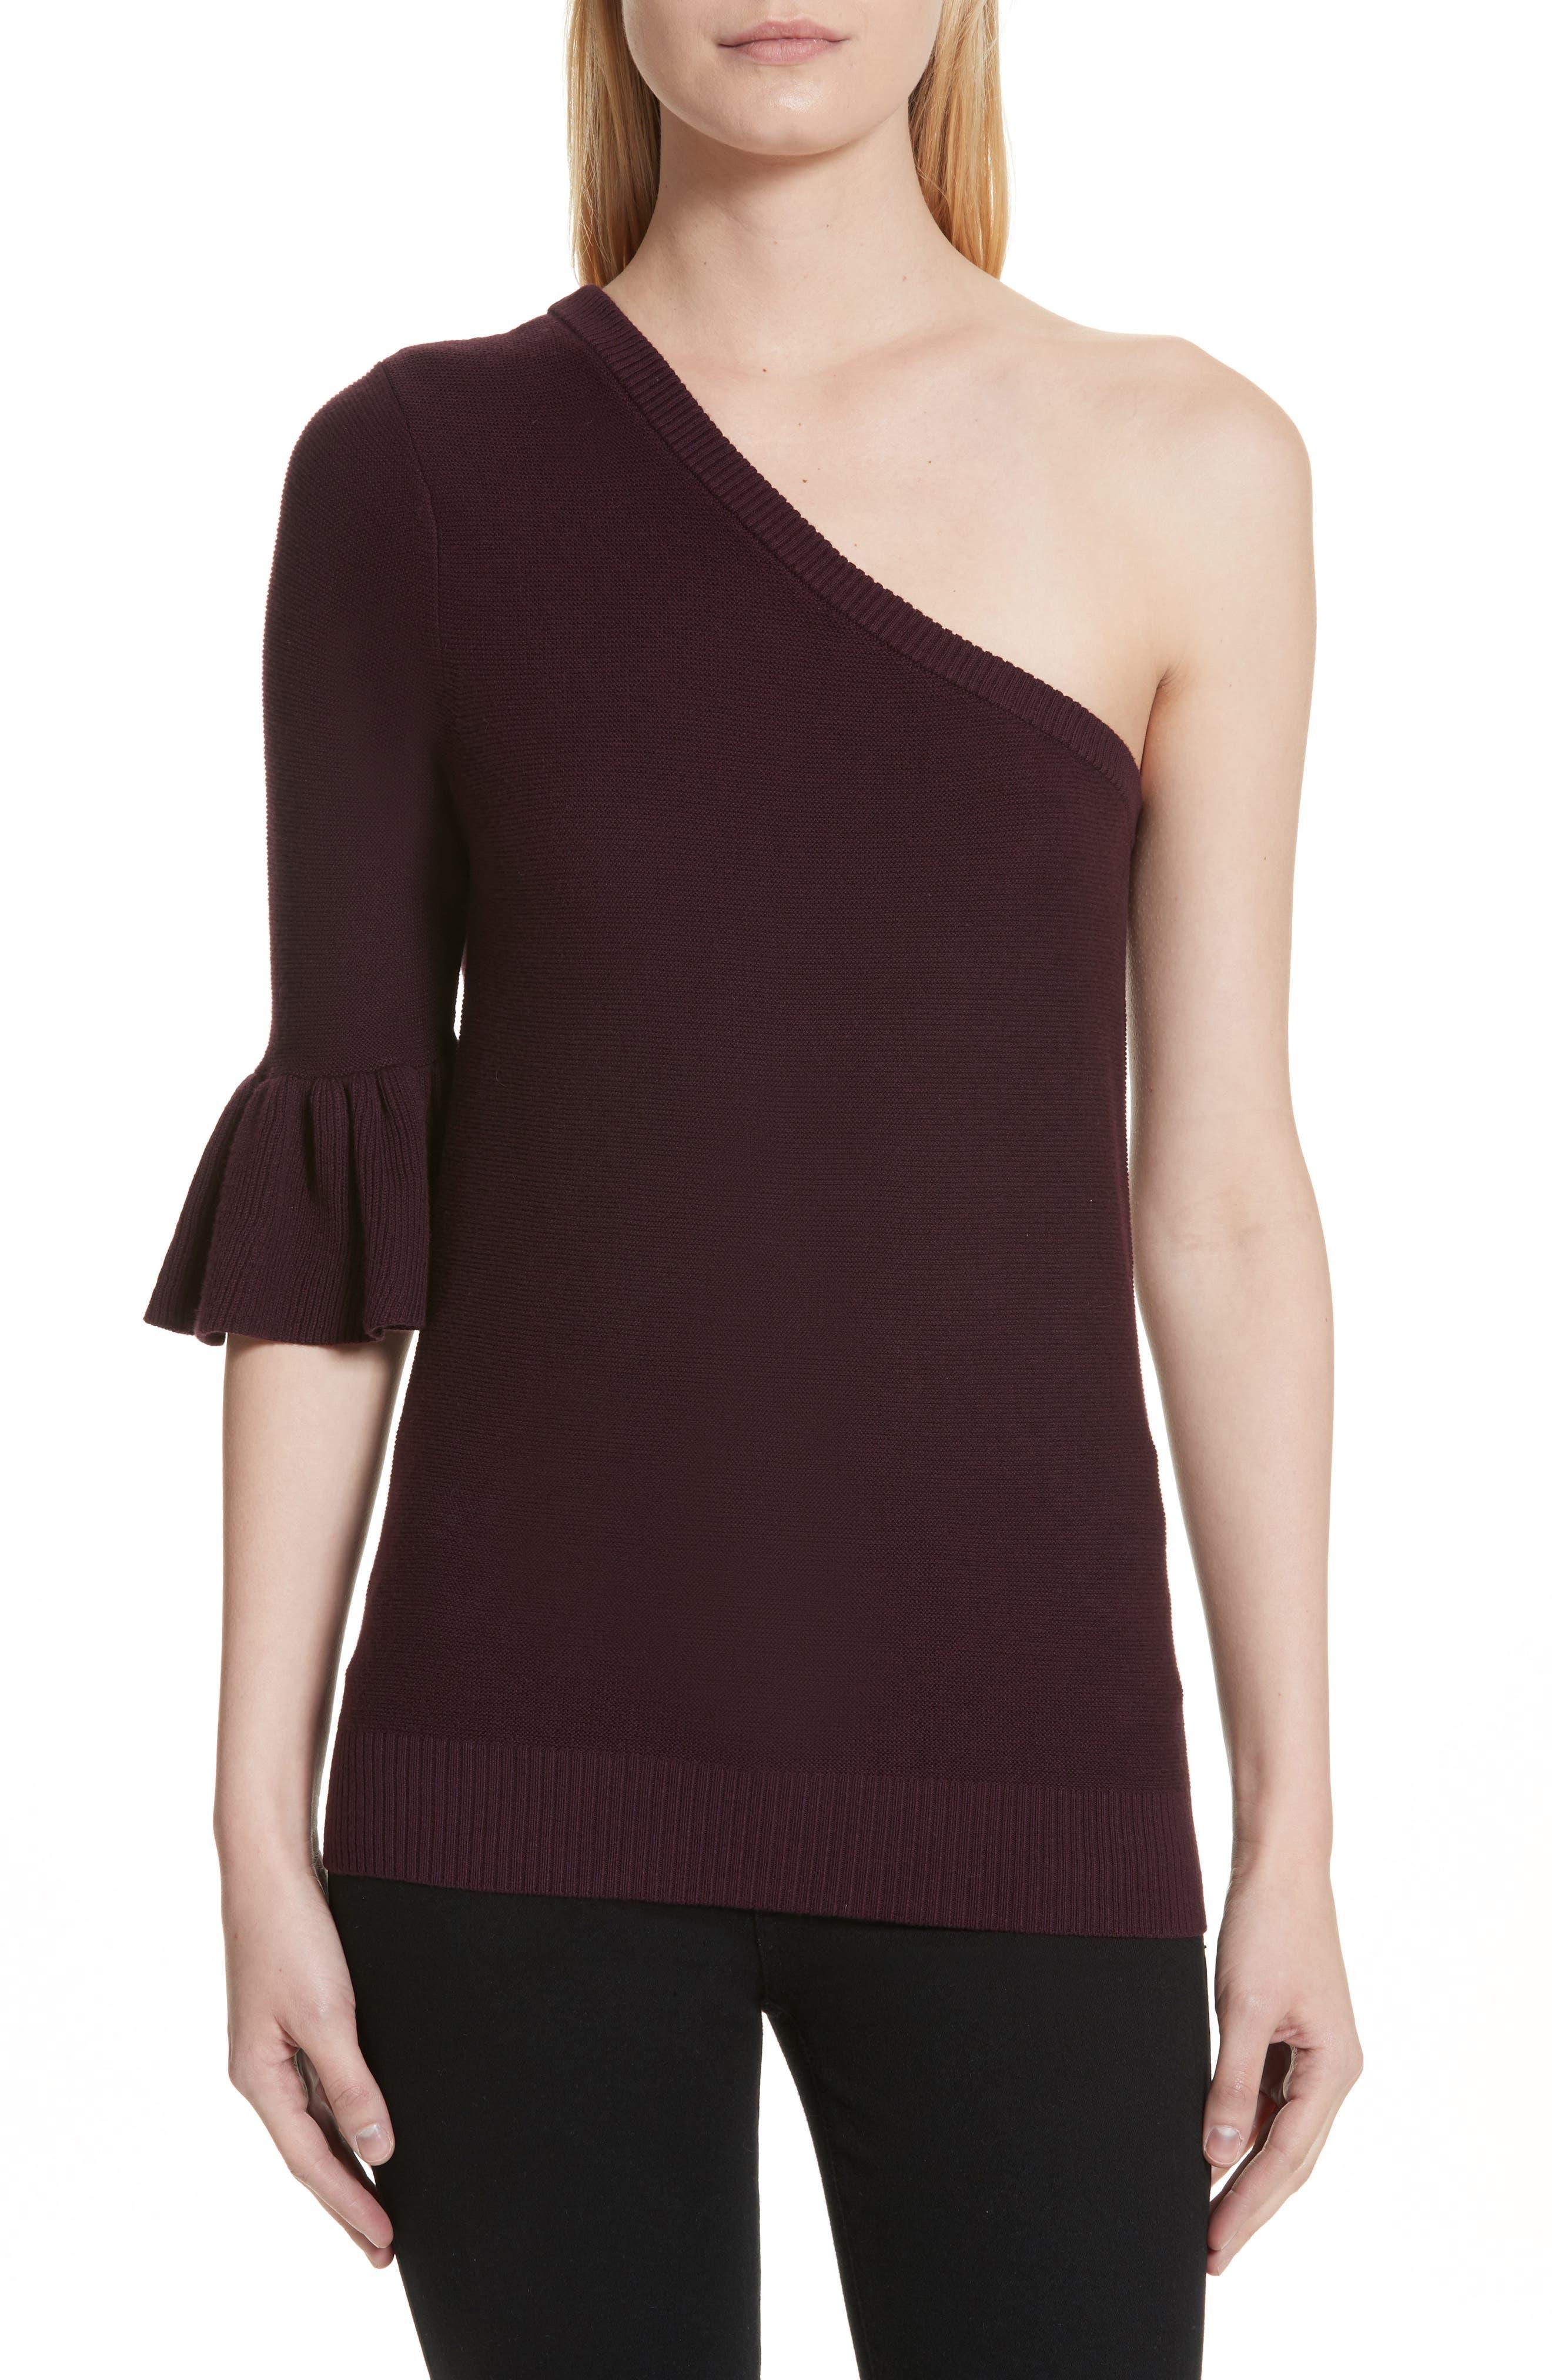 Rebecca Minkoff Wappo One-Shoulder Sweater